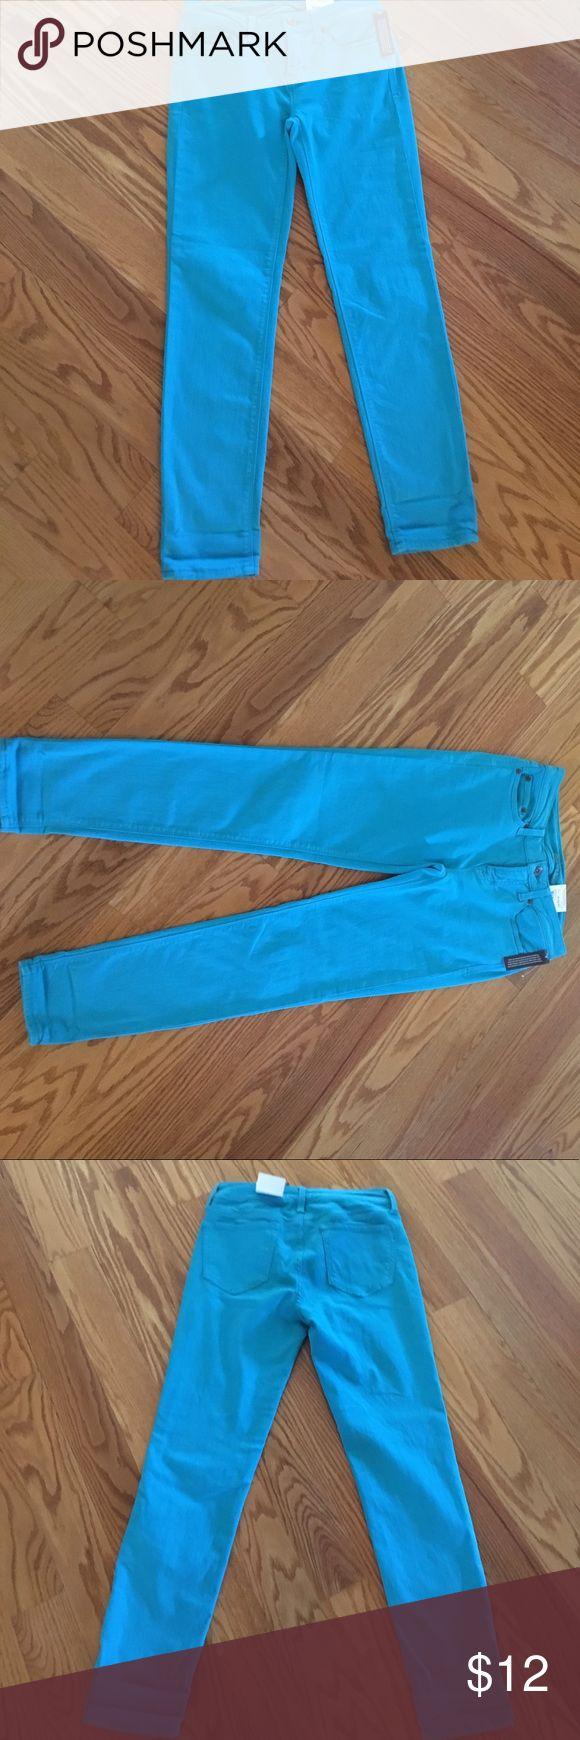 Straight  leg  skinny jeans🦋 Beautiful color Island Teal Skinny jeans NWT Stylus Jeans Skinny